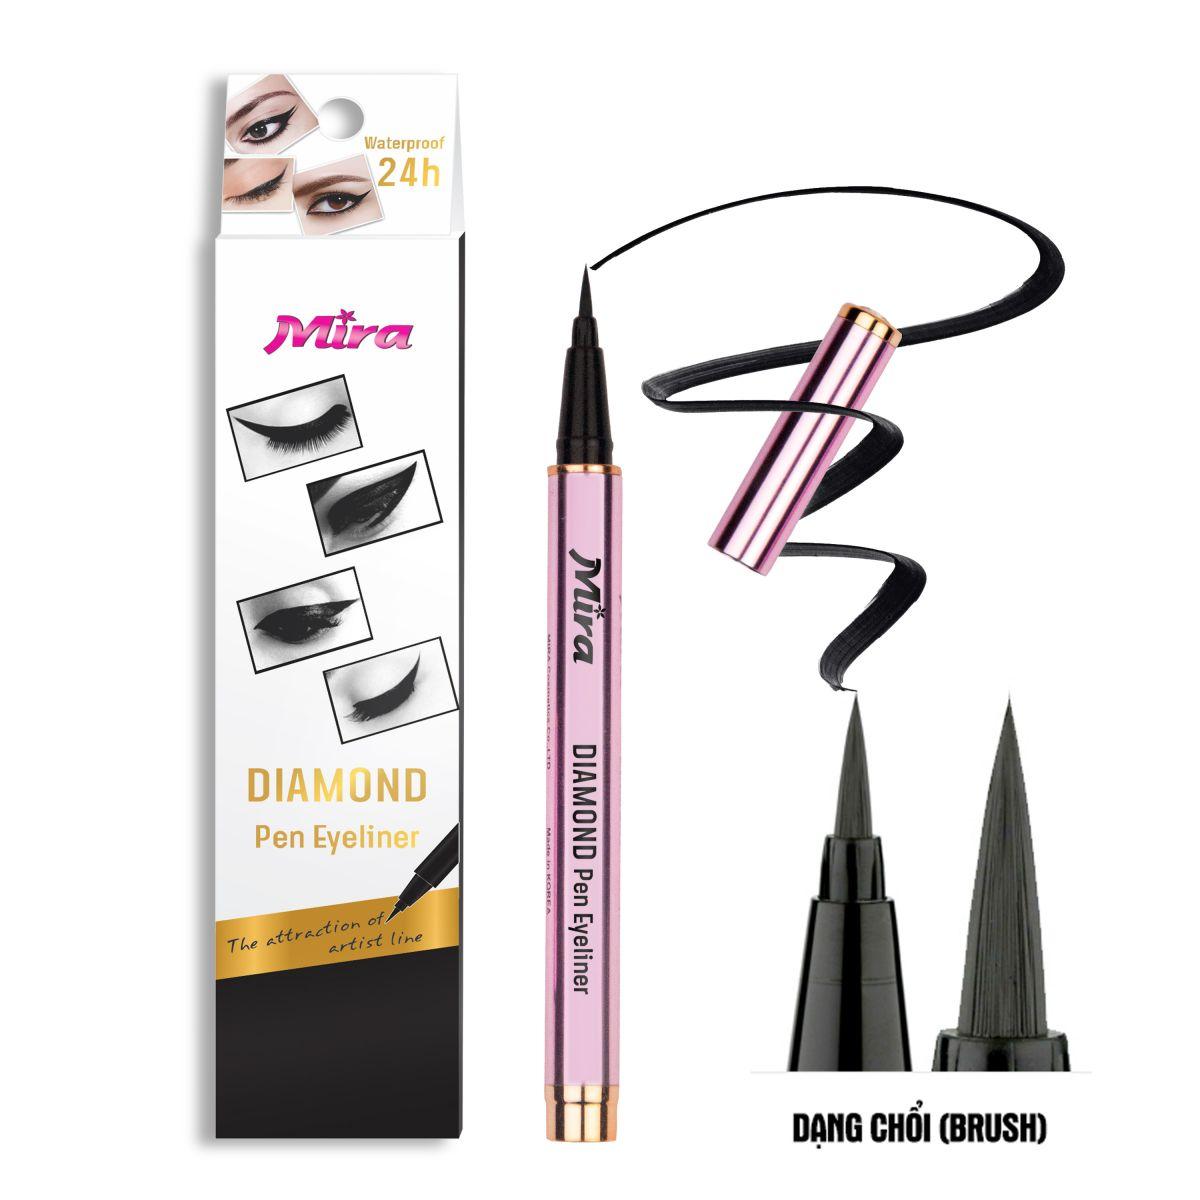 Bút Kẻ Mắt Không Trôi Mira Diamond Pen Eyeliner